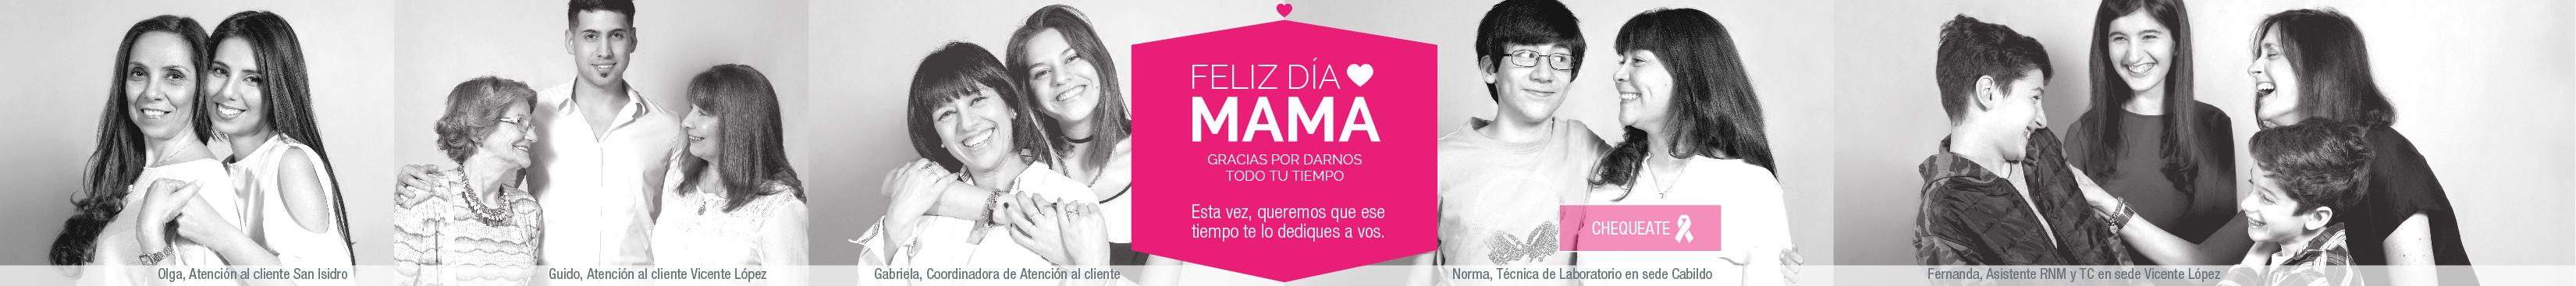 Banner-Web_Campaa-mamamam